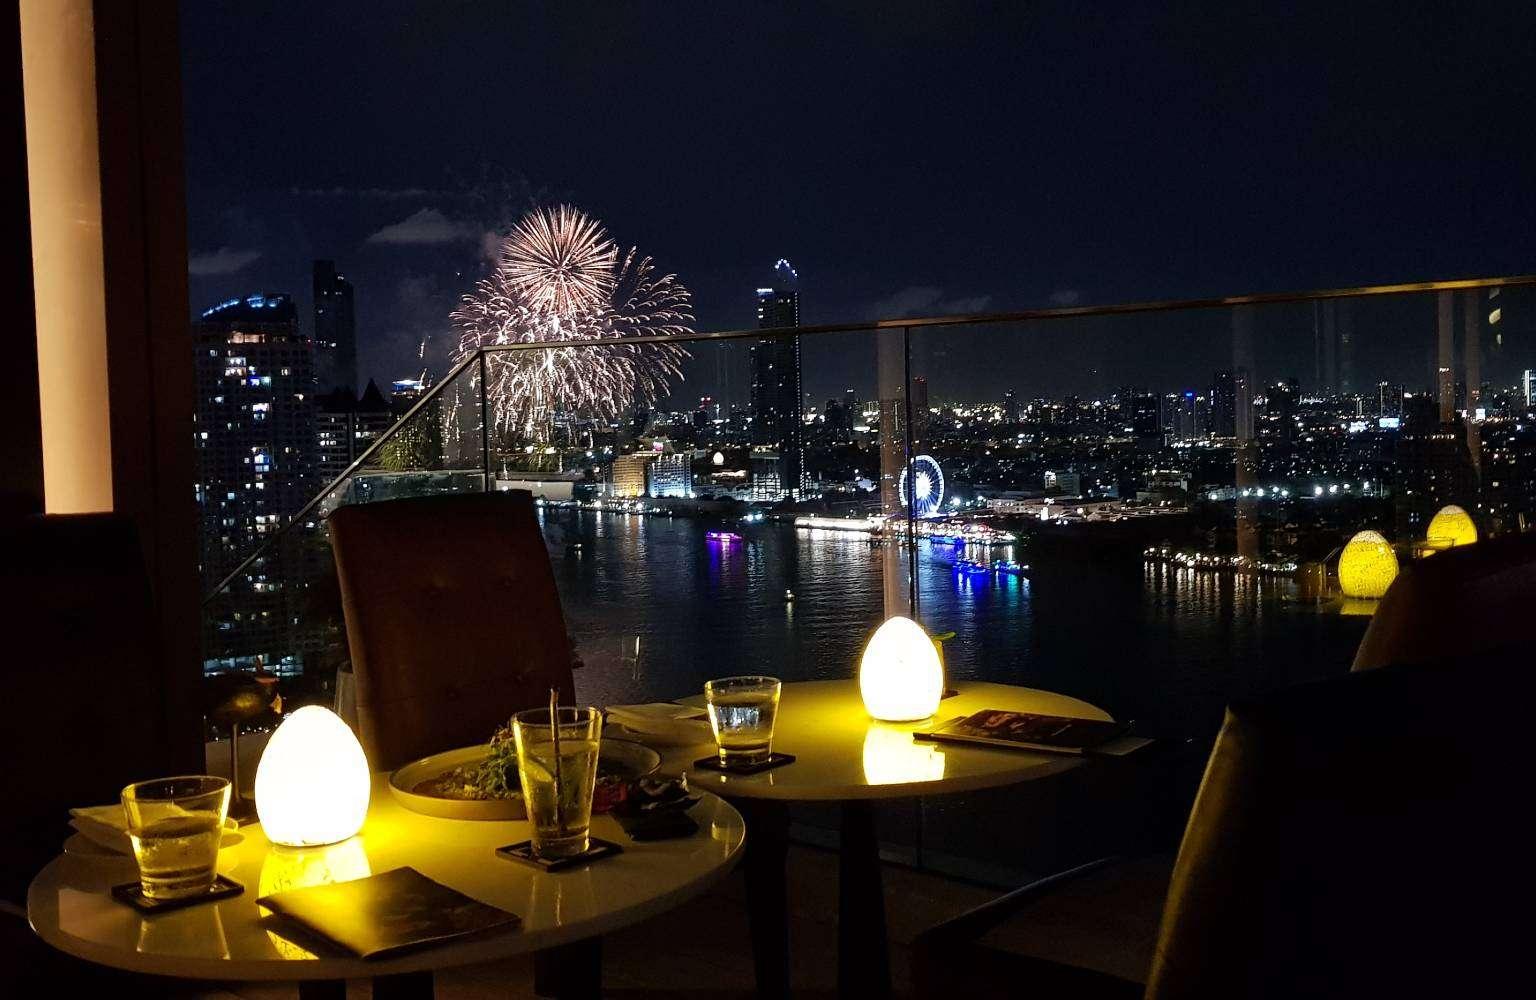 SEEN Sky Bar at Avani+ Riverside Bangkok Hotel with views of the Chao Phraya River and fireworks.